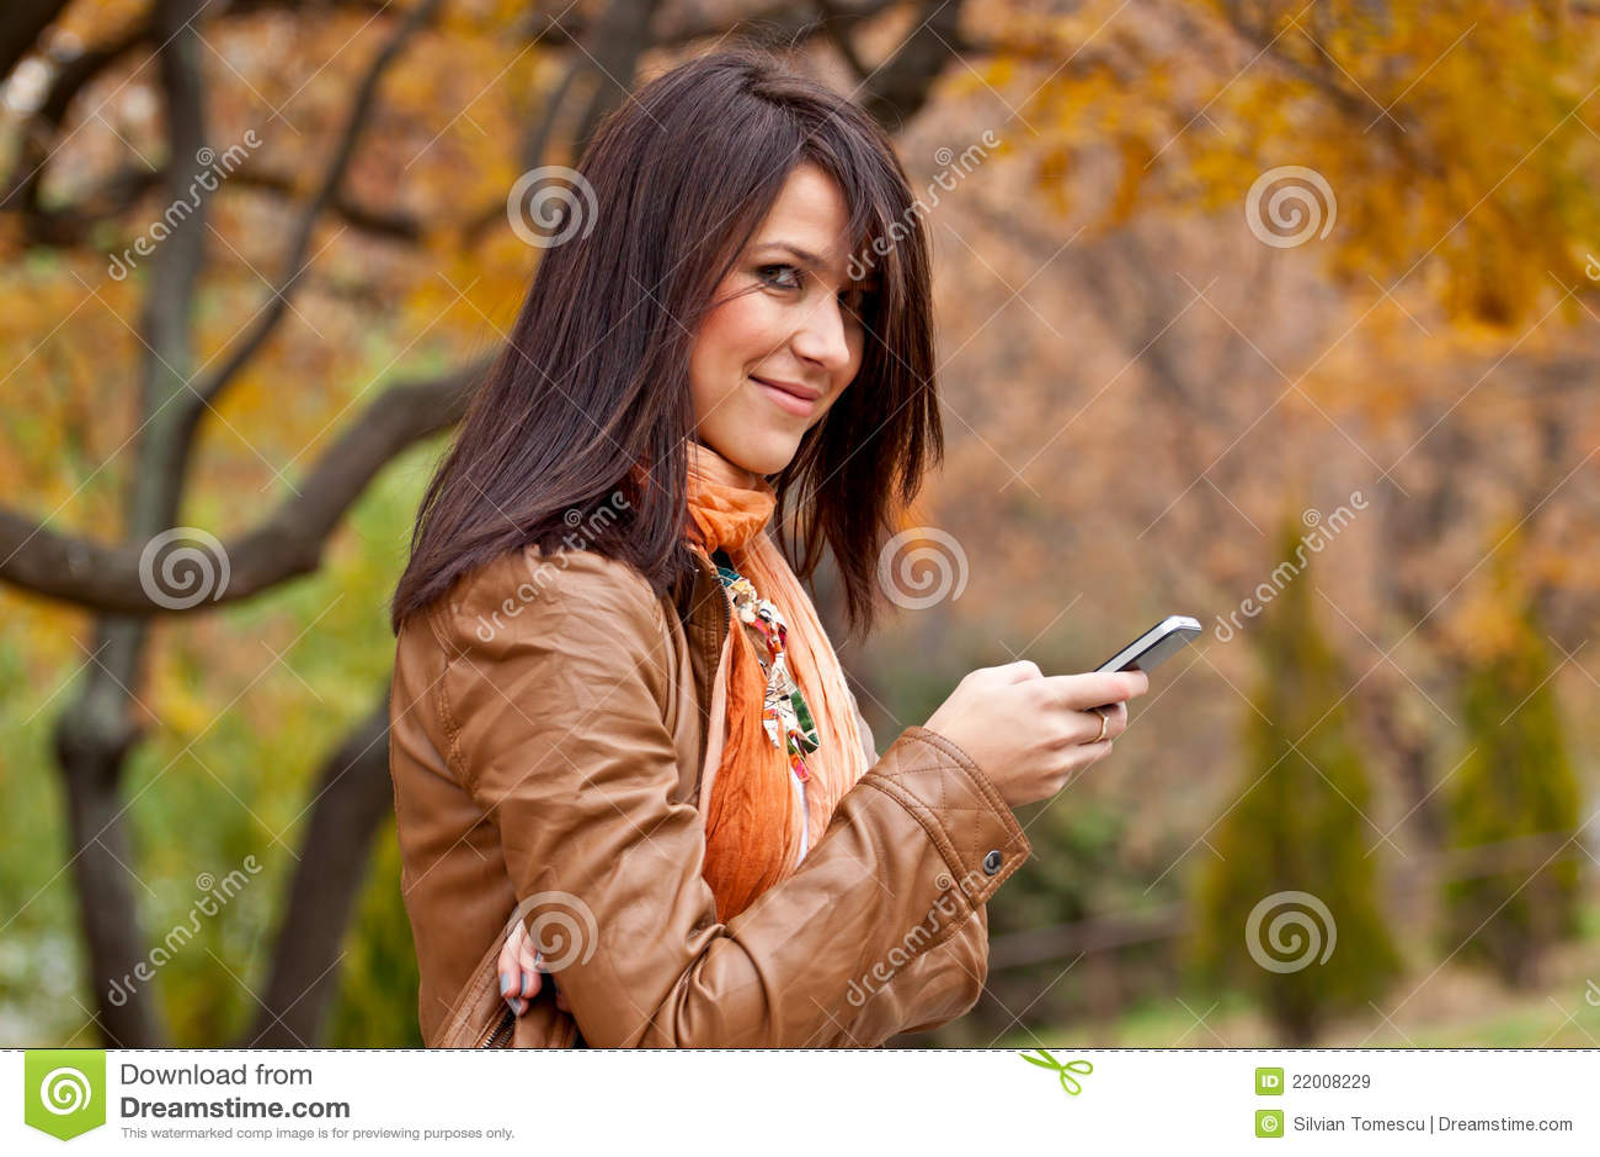 Pasion voor mobiele technologie